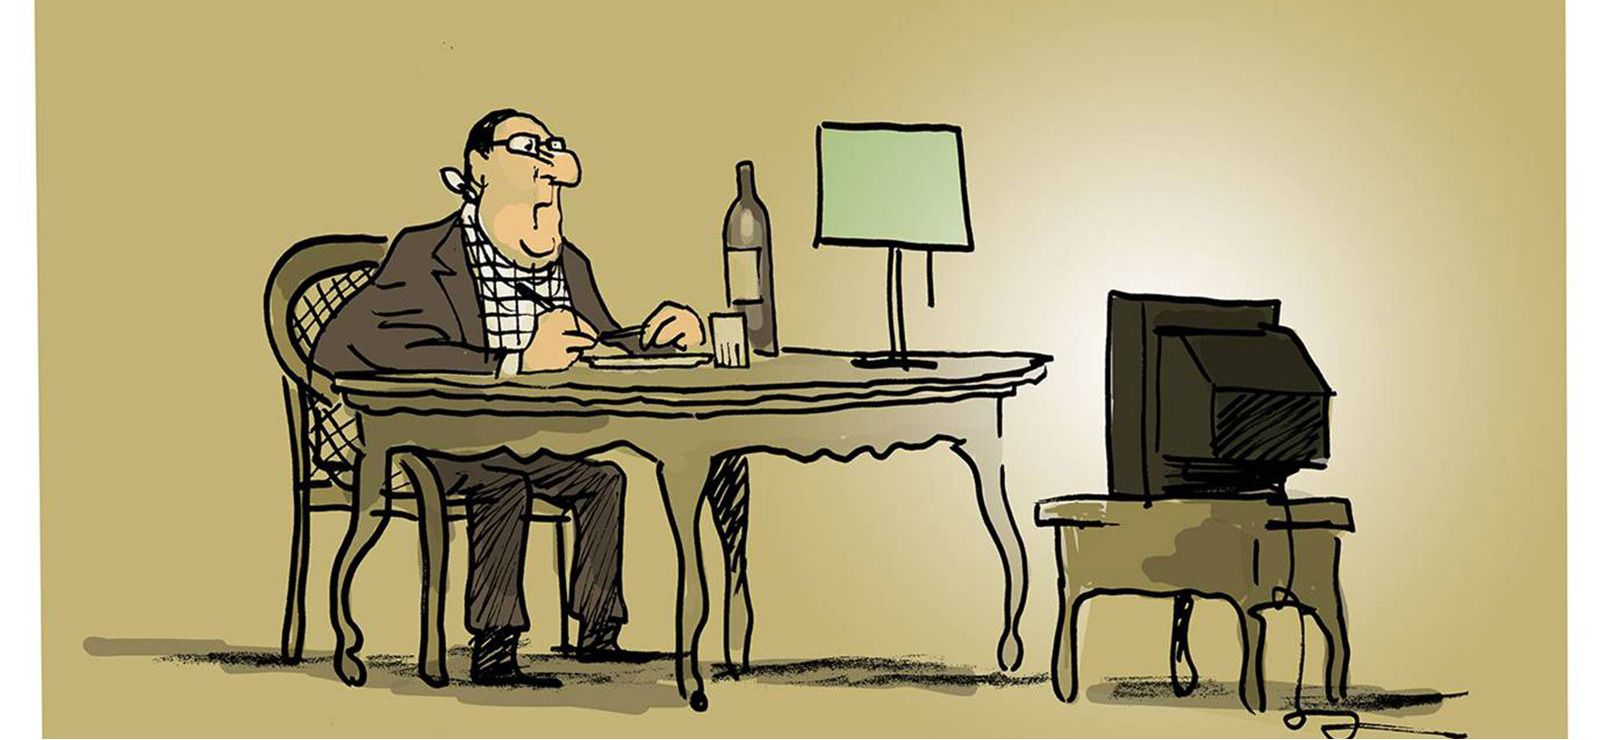 Les dessins de la semaine : Hollande isolé, Hollande expulsé